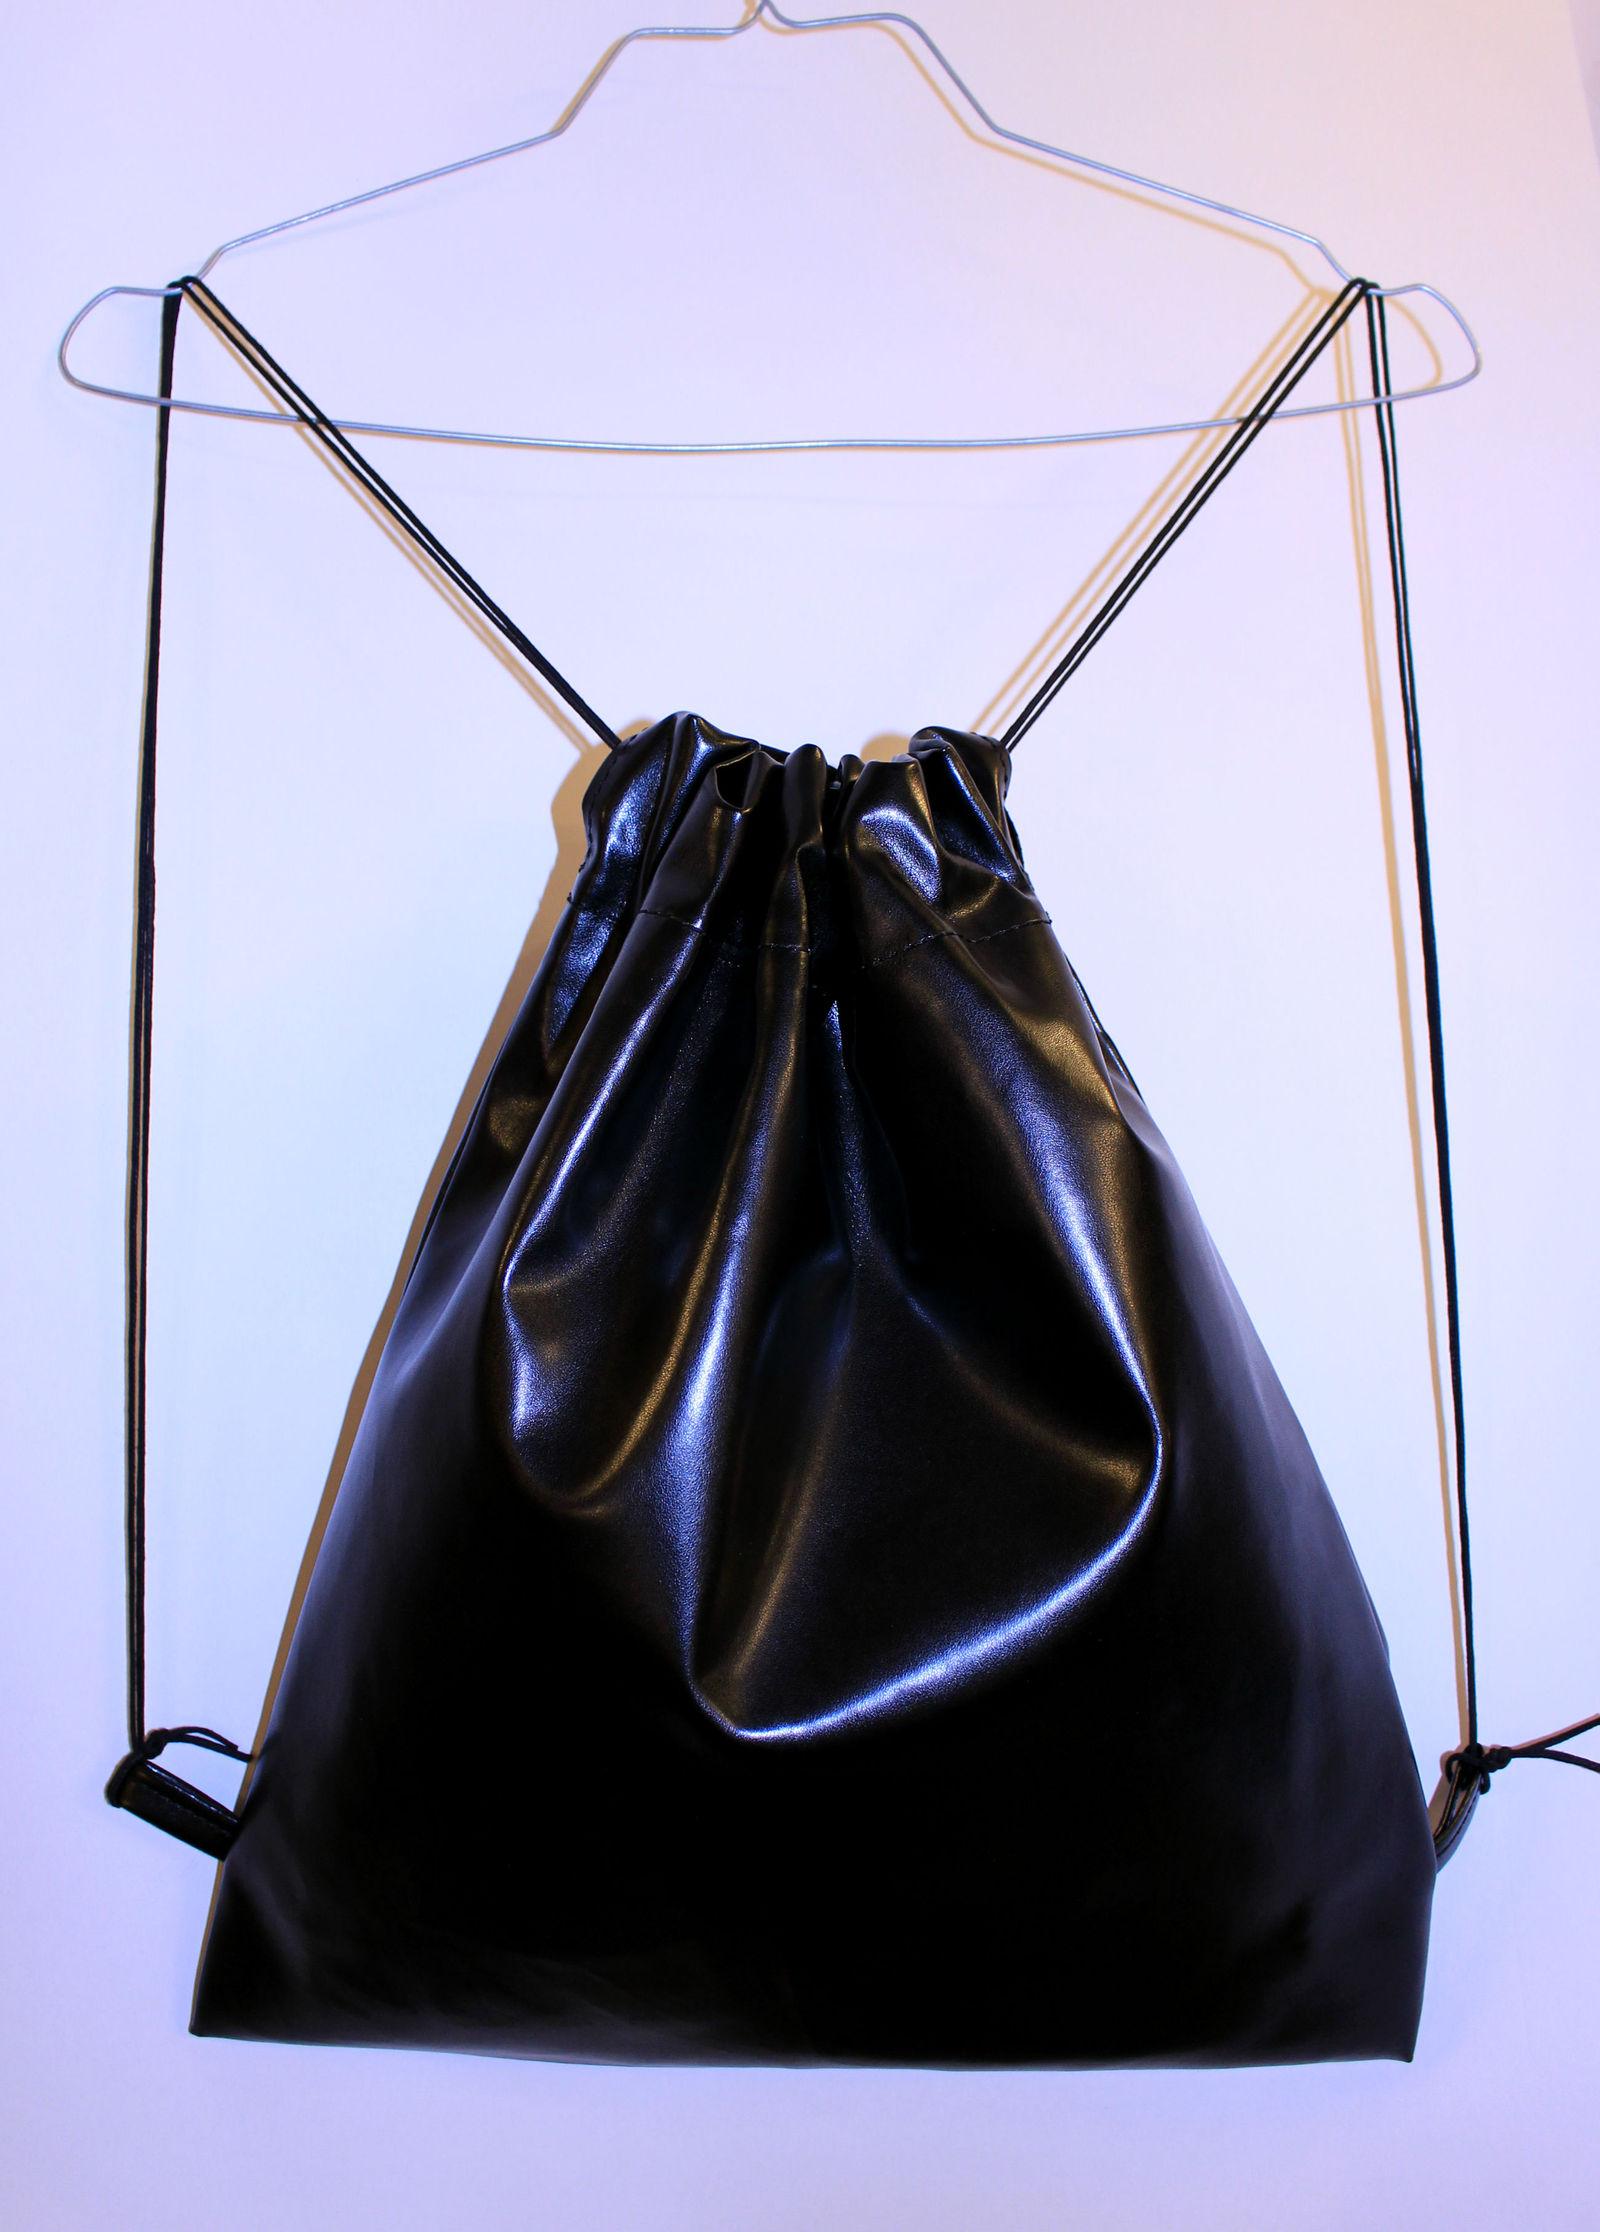 c1ee8c548e50 Рюкзак-мешок кто такое носит?